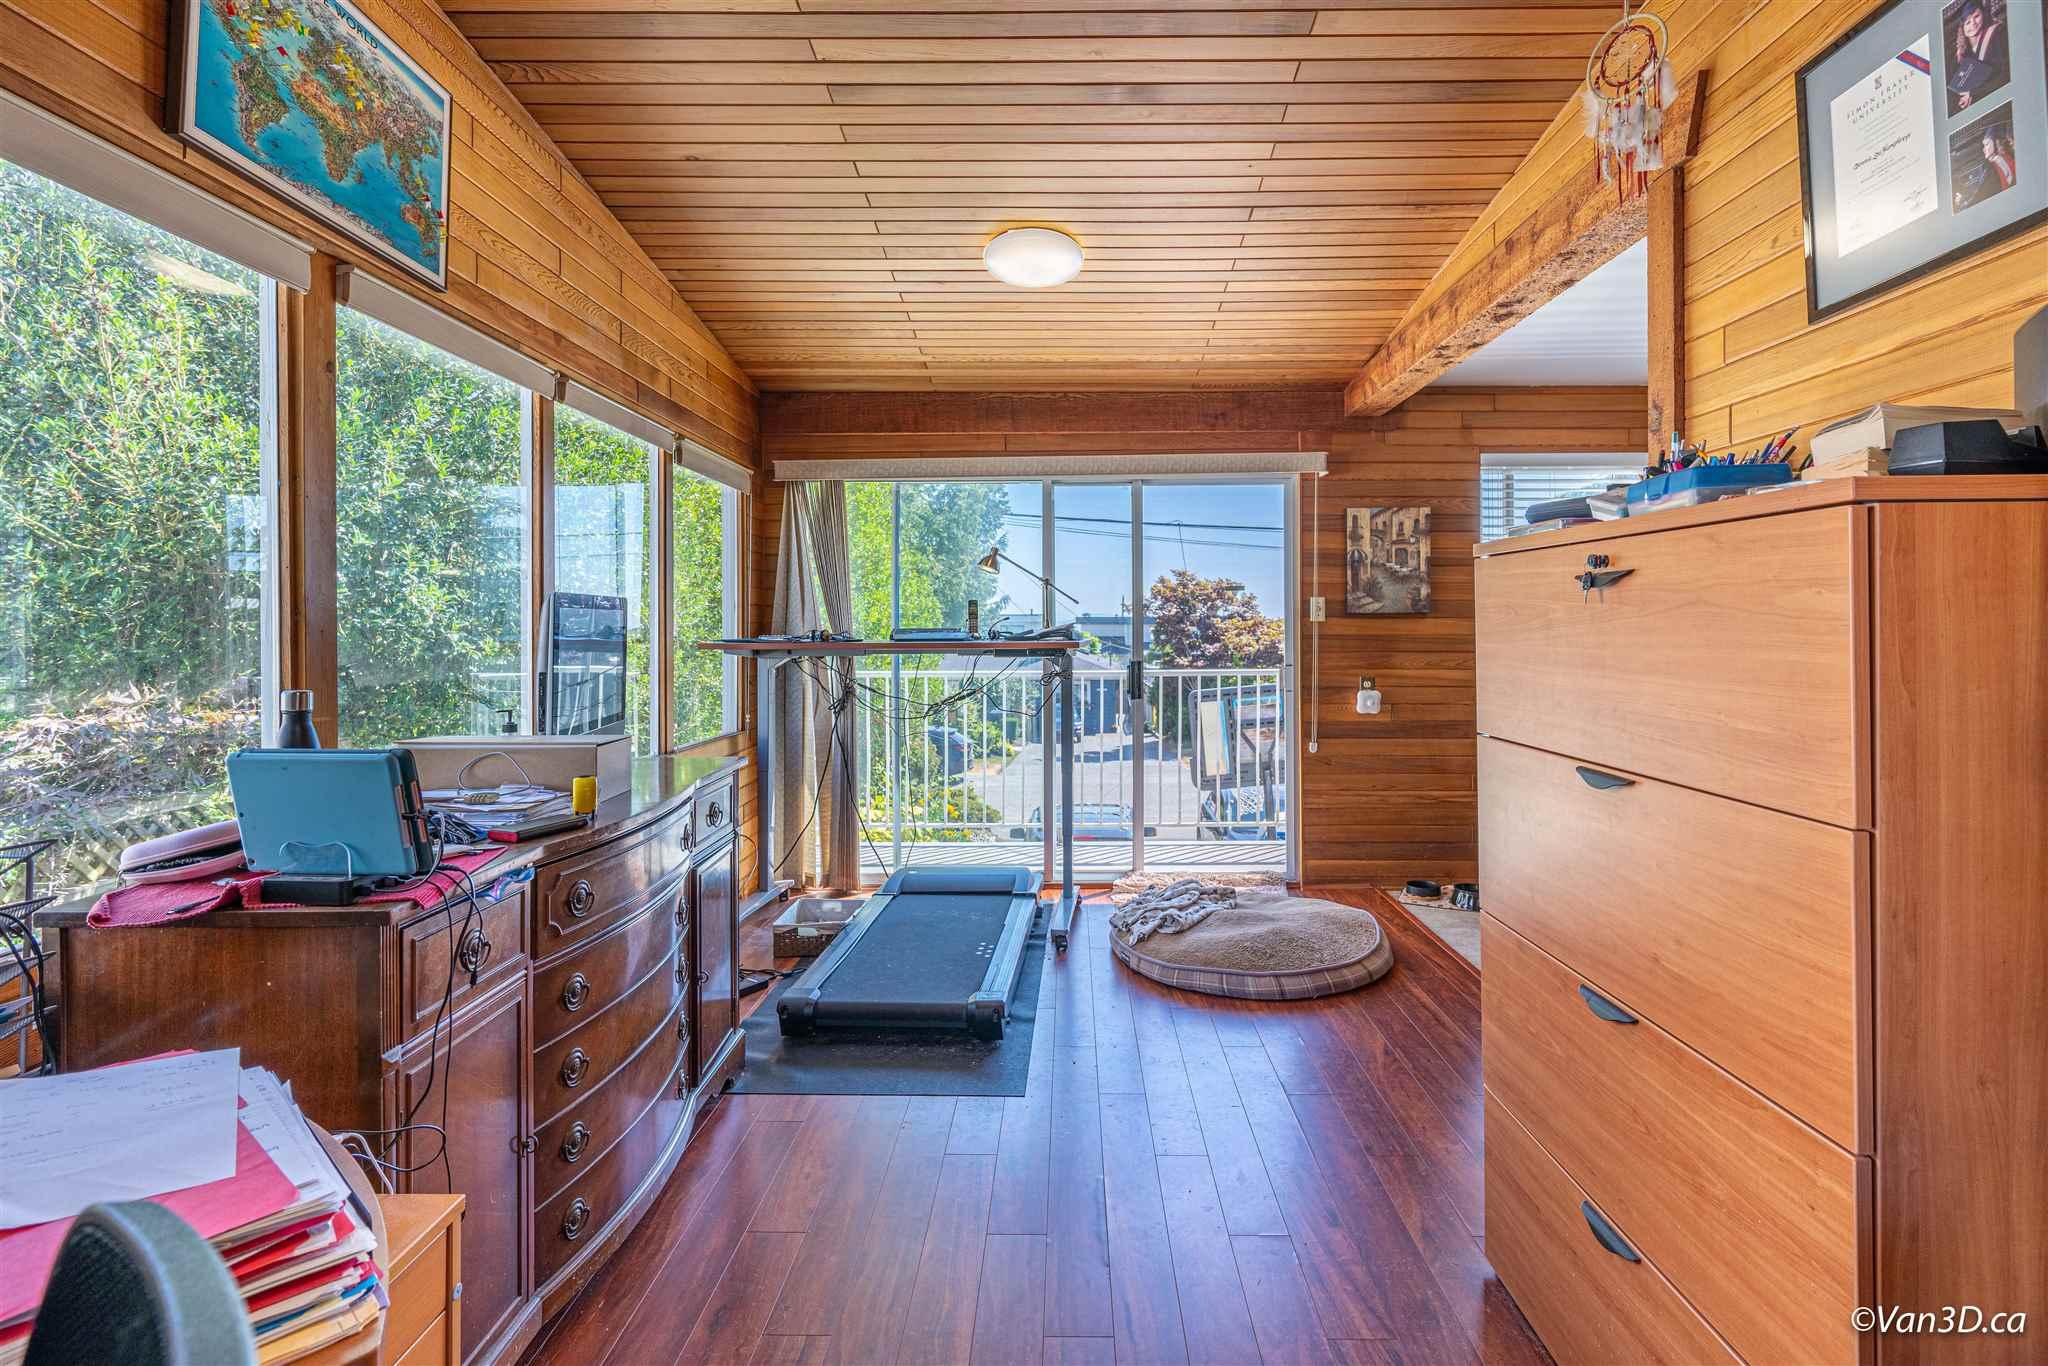 14495 MANN PARK CRESCENT - White Rock House/Single Family for sale, 4 Bedrooms (R2604561) - #27